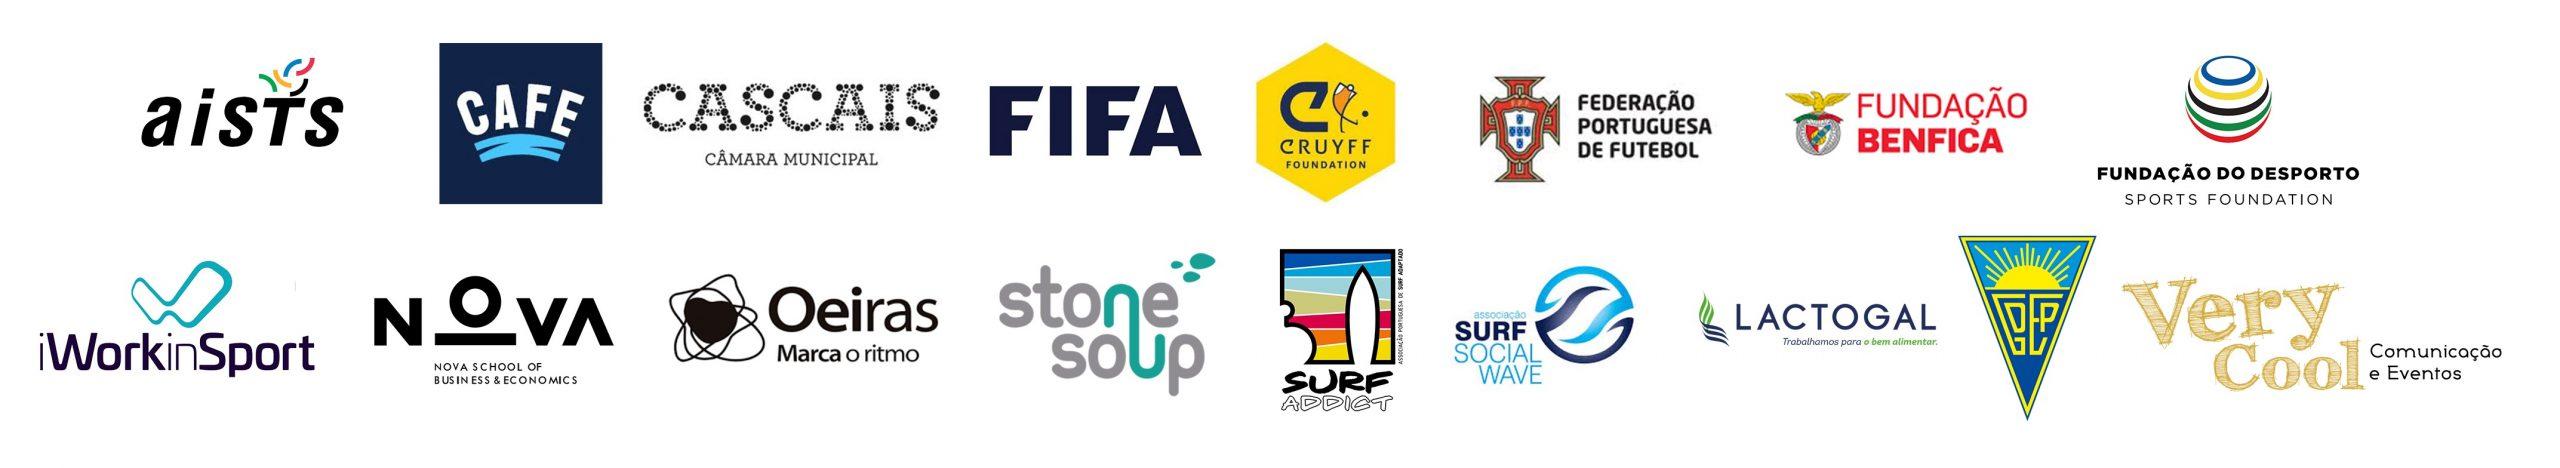 FALP partners logos: aists, CAFE, City of Cascais, Johan Cruyff Foundation, FIFA, Portuguese FA, Benfica Foundation, iWorkinSport, Nova SBE University, City of Oeiras, Stone Soup Consulting, Surf Addict Adapted Surf Association, Surf Social Wave, Estoril Praia SAD and Very Cool Events